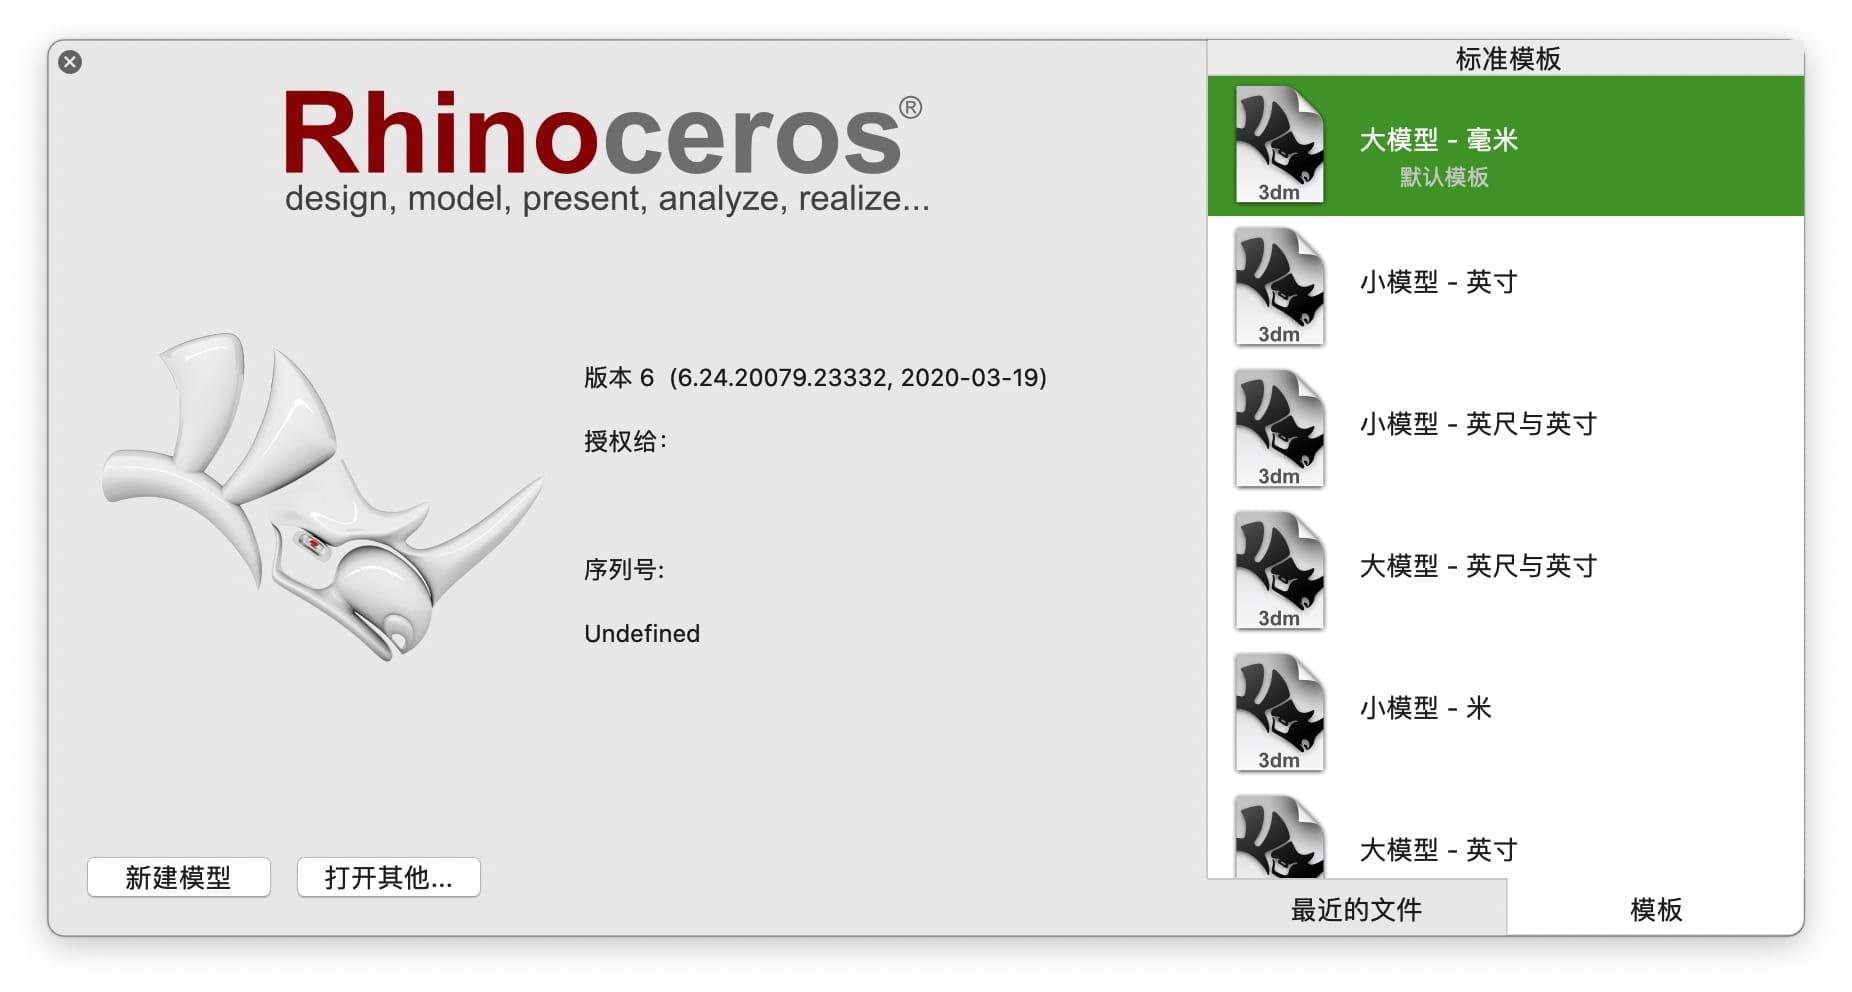 Rhino 7.7.21160.05002  中文破解版 强大的3D造型软件  第2张